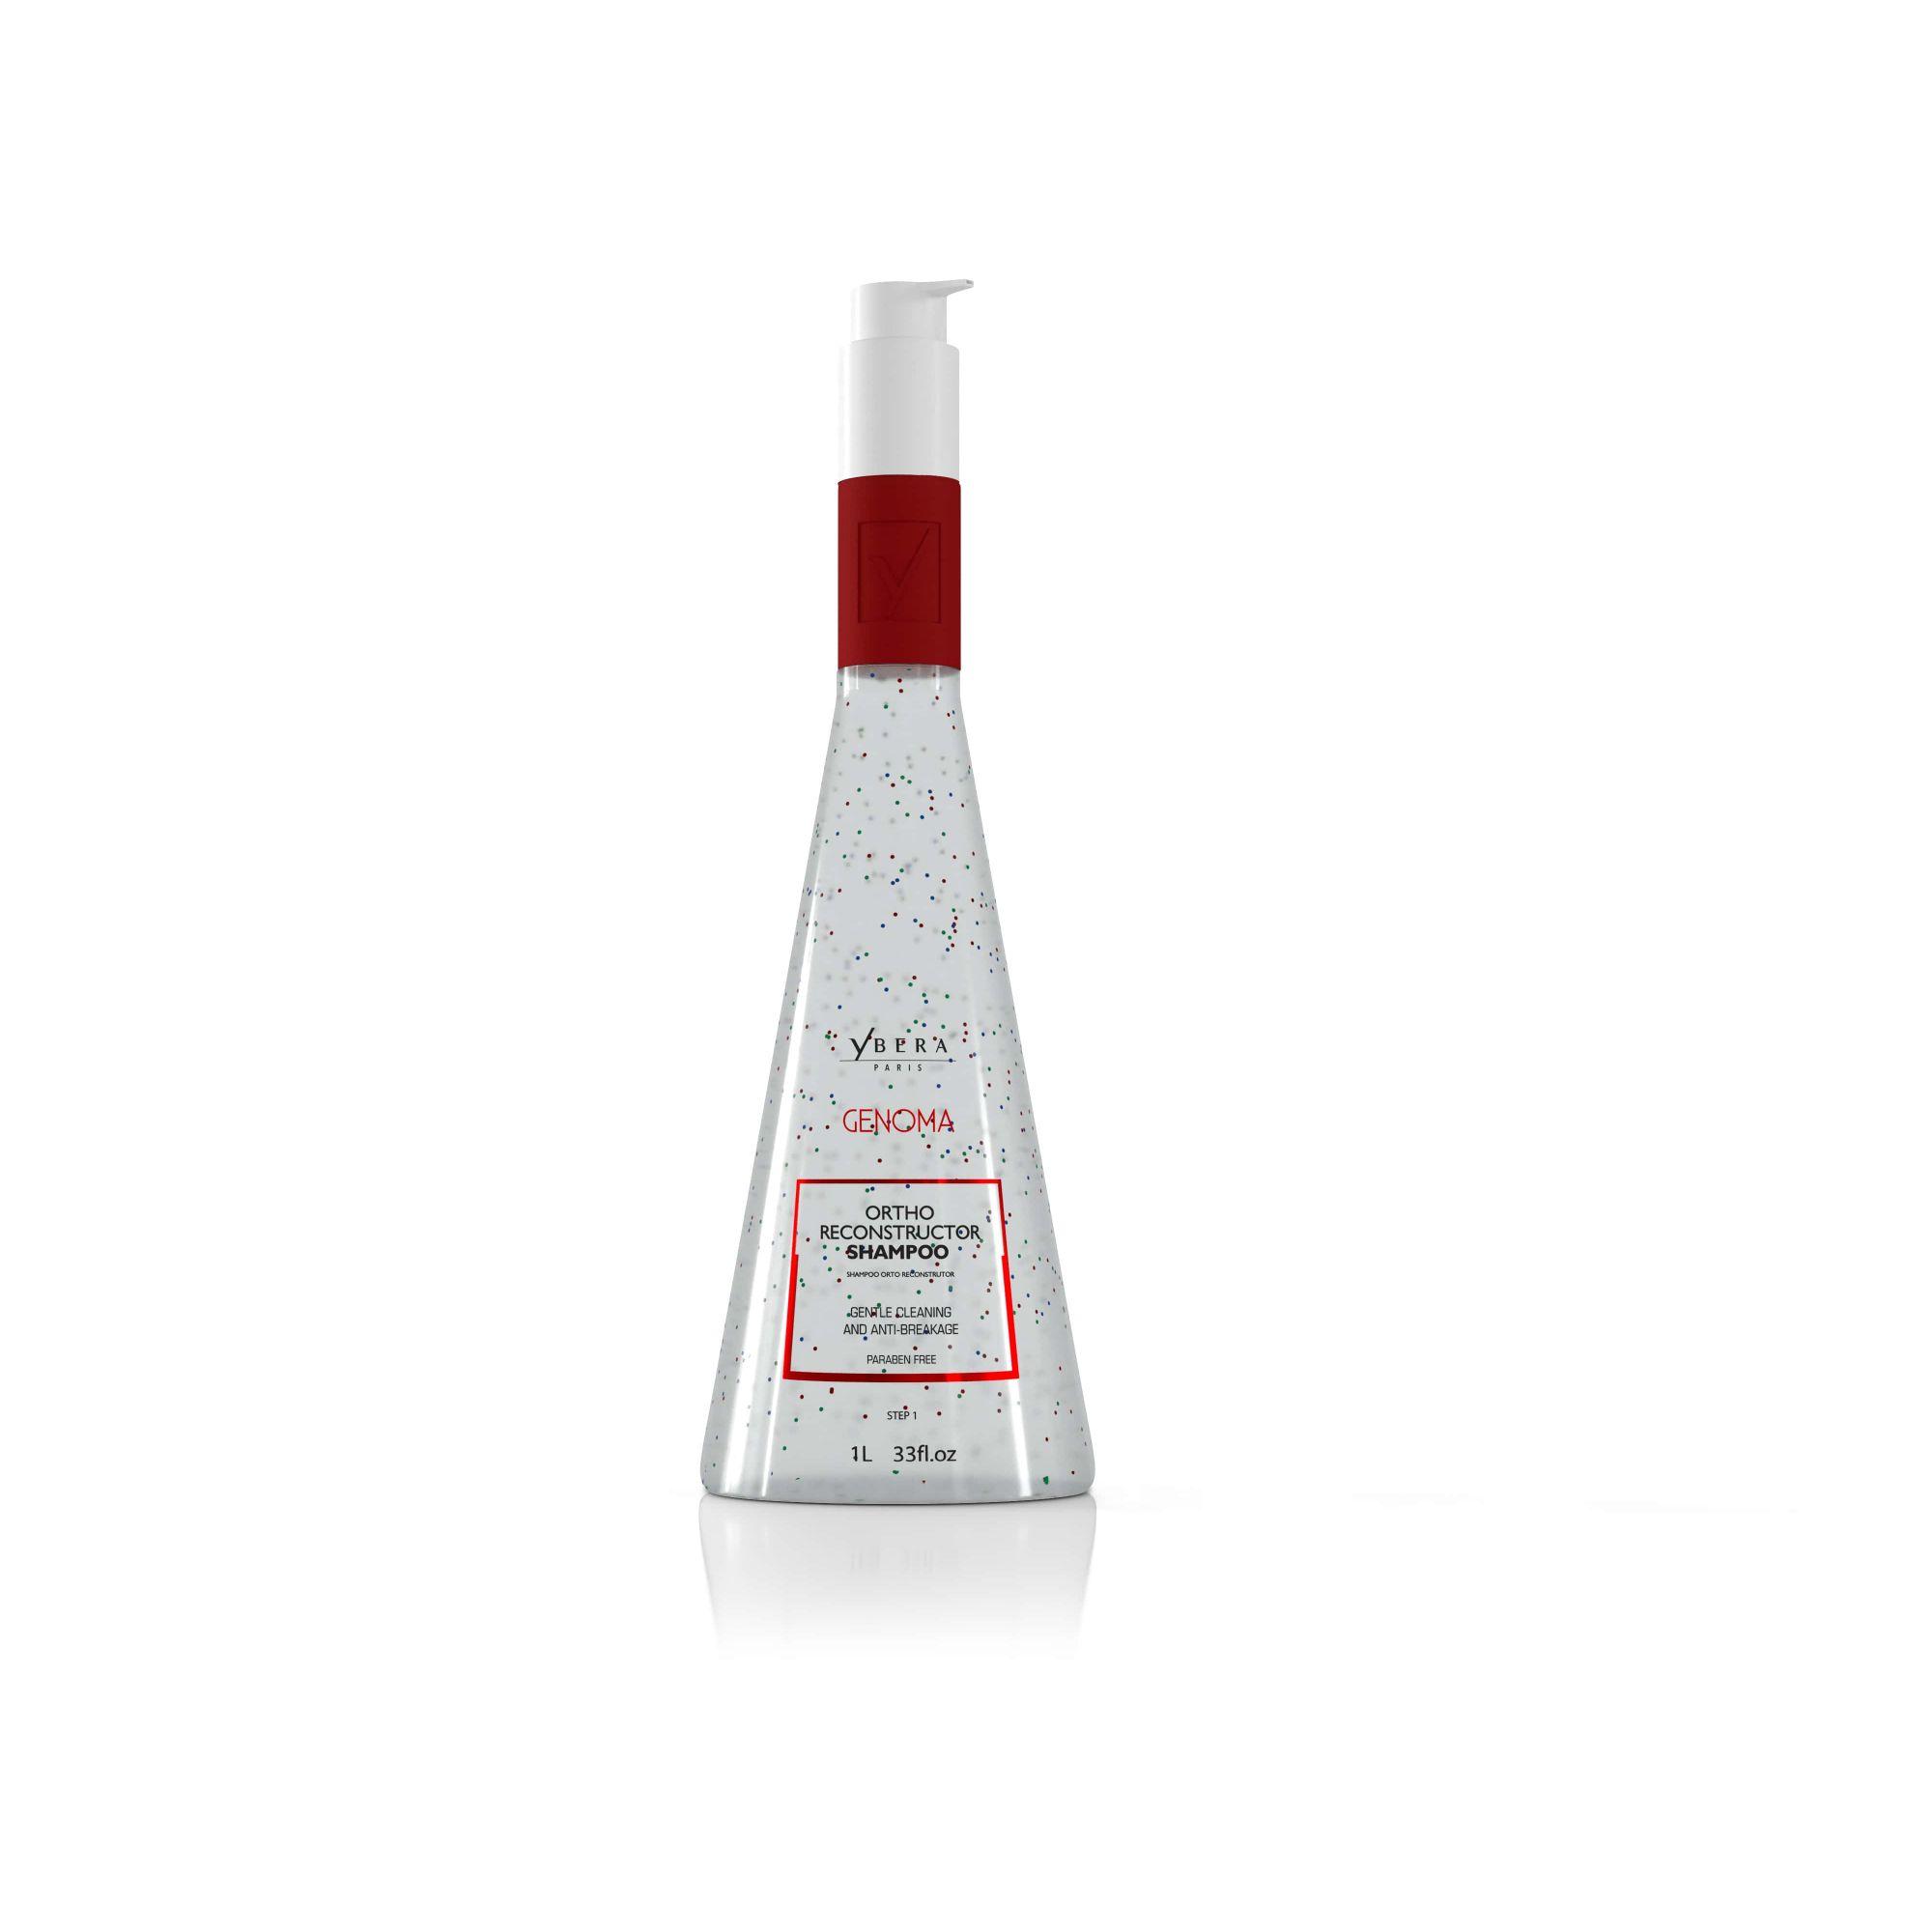 Shampoo Hidratante Genoma  Ybera Paris 1L